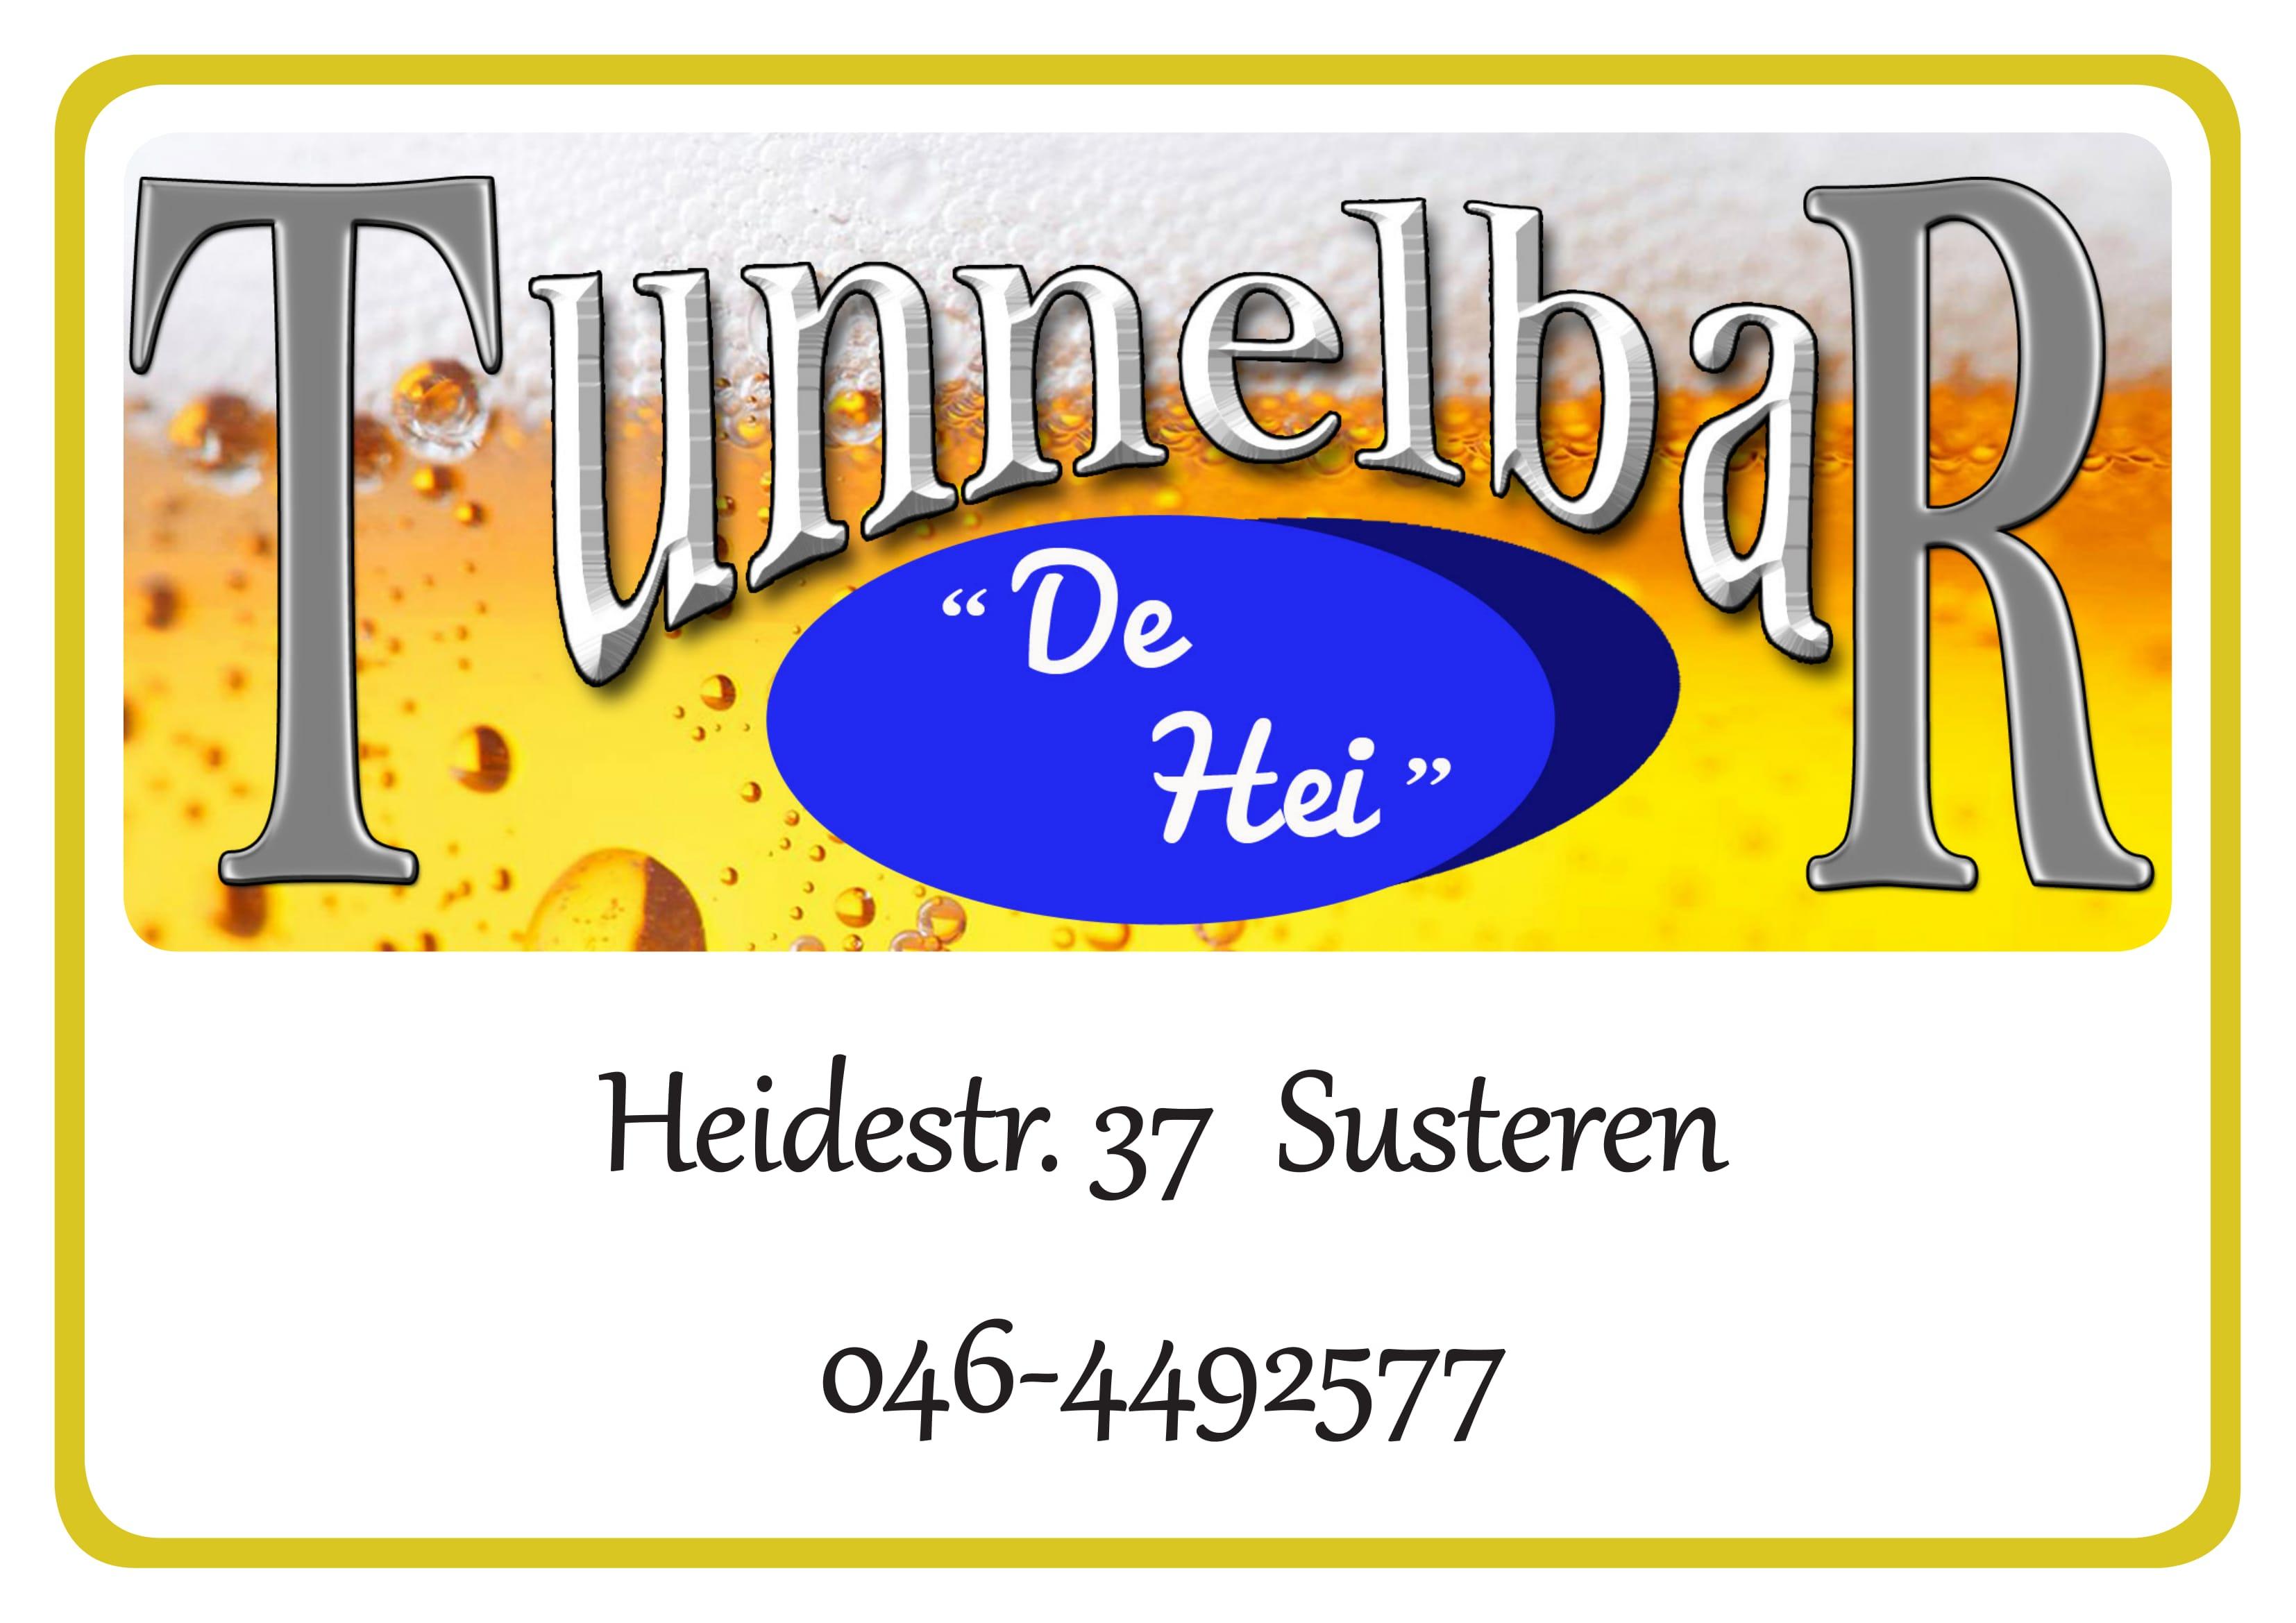 Cafe de Tunnelbar